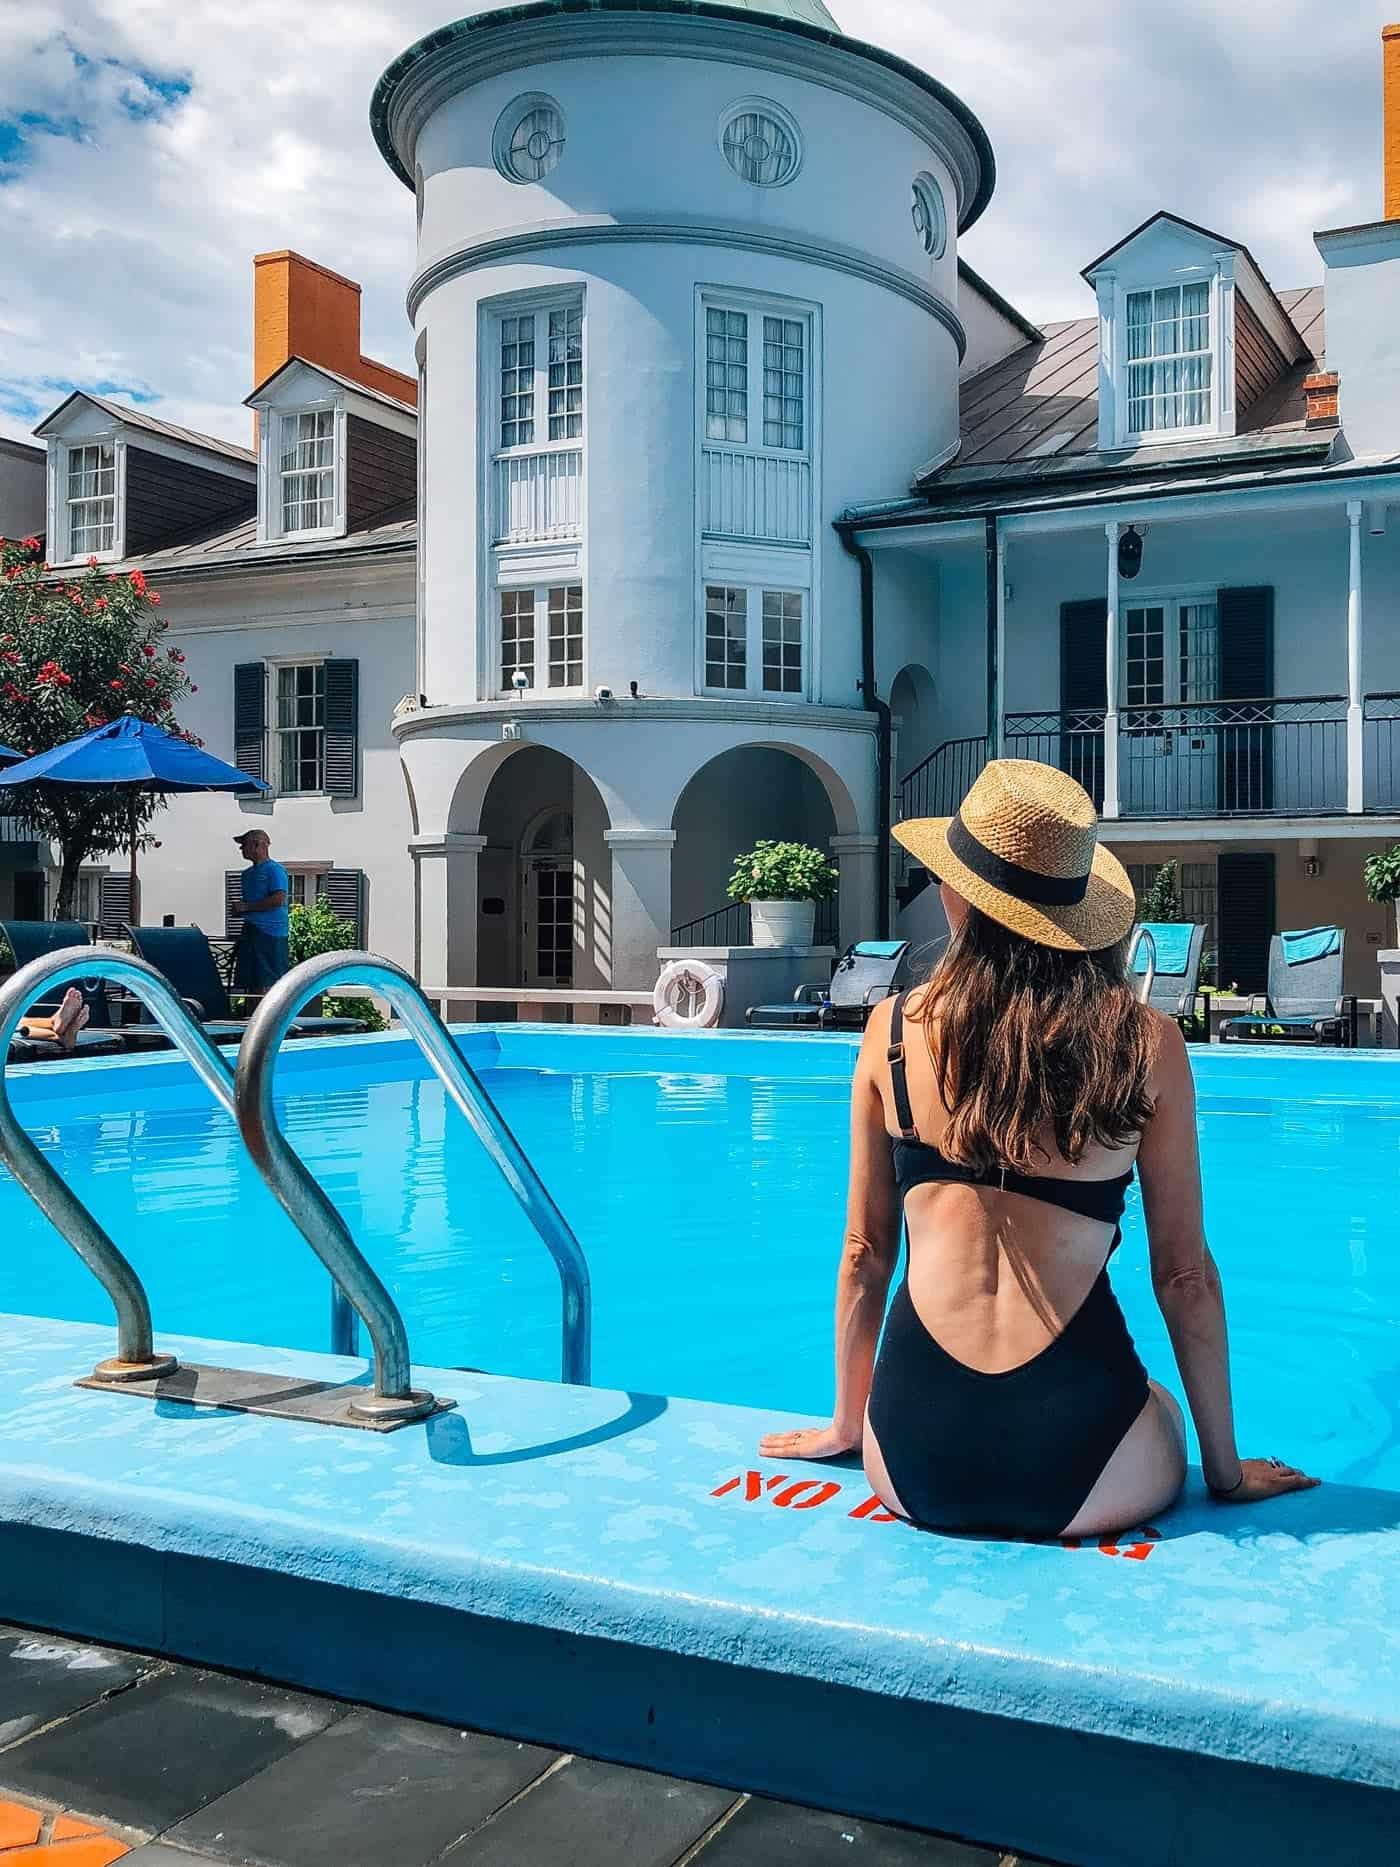 Royal Sonesta New Orleans Hotel Review | Blue Mountain Belle